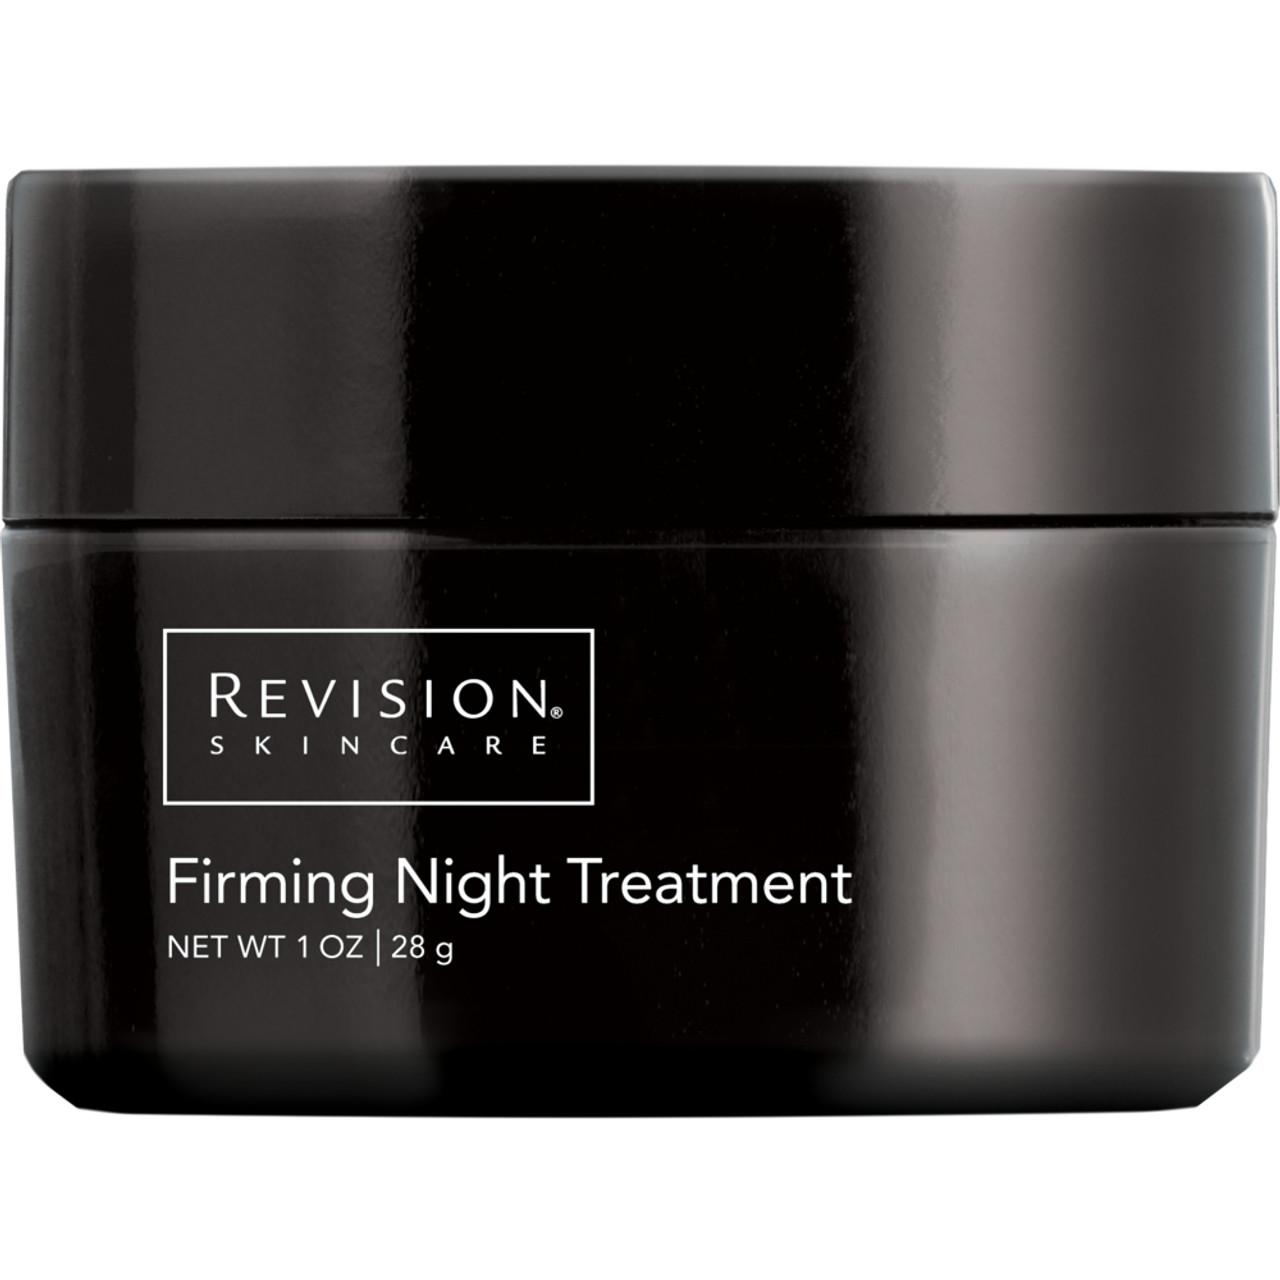 Revision Firming Night Treatment BeautifiedYou.com